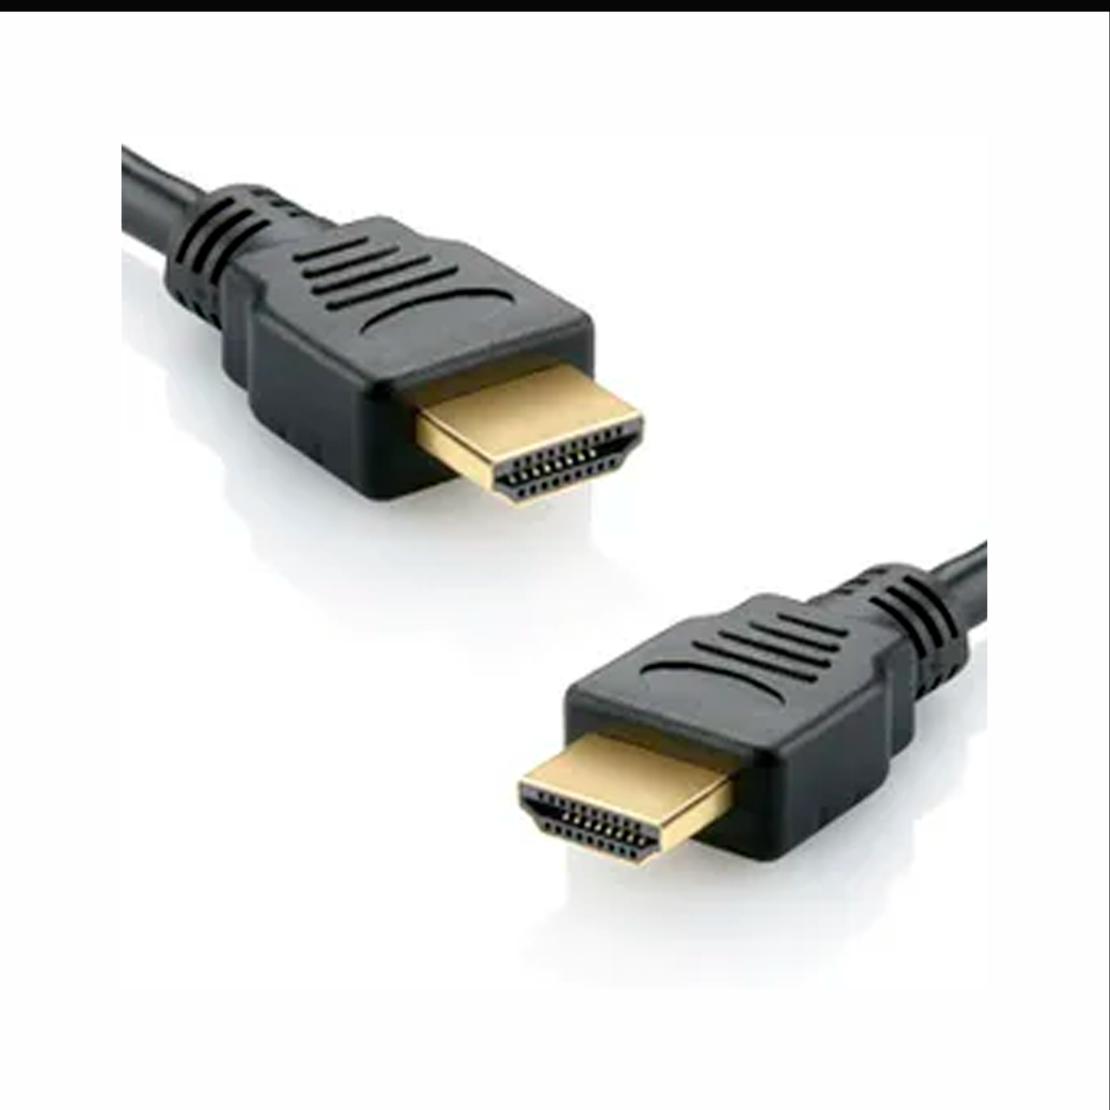 CABO HDMI 10M 1.4 WI250 MULTILASER